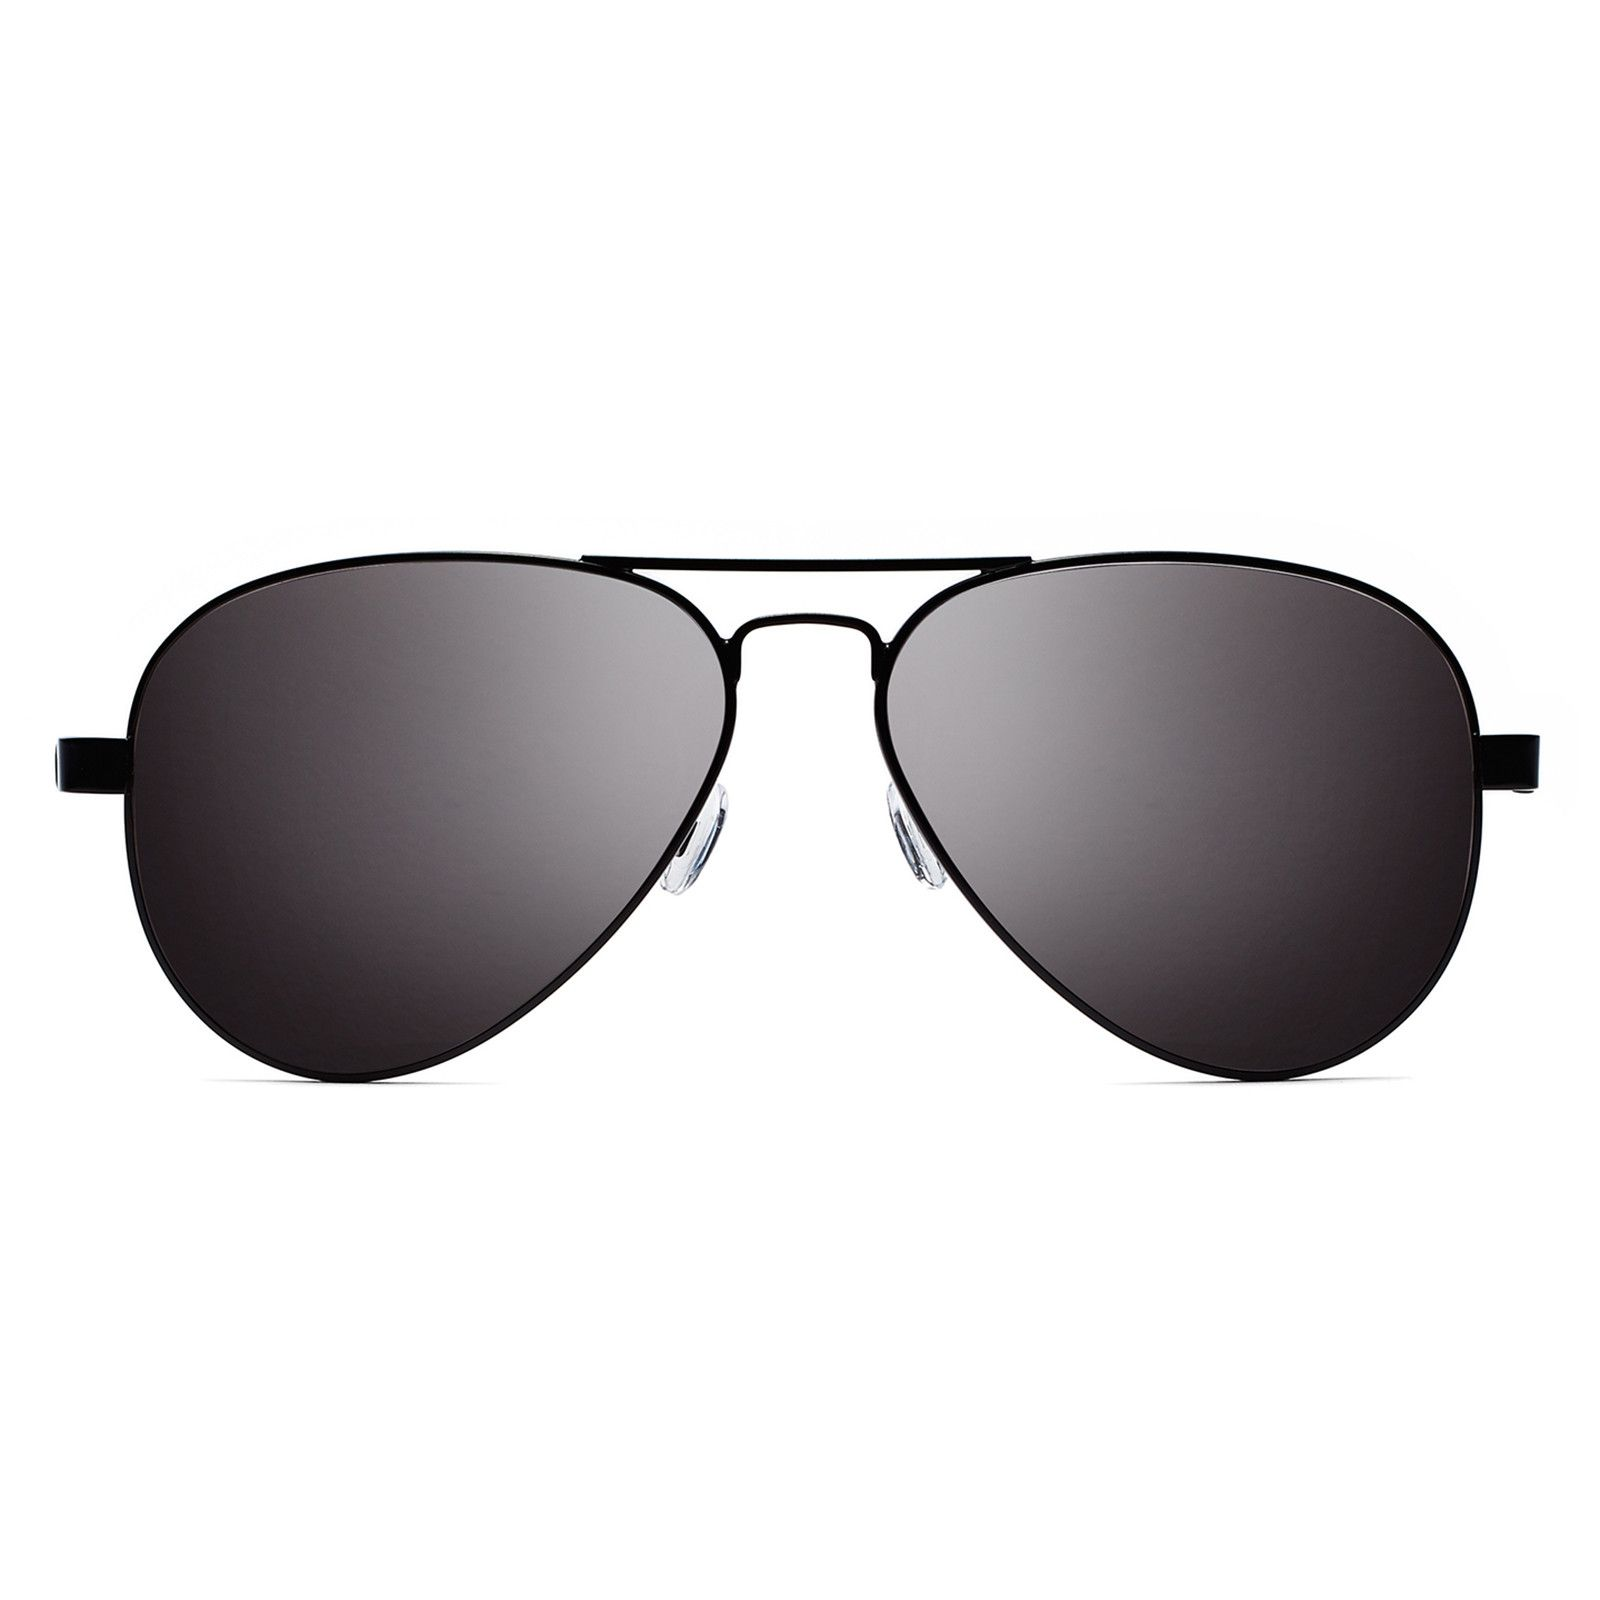 Runaway Sunglasses Women Sunglasses Mens Sunglasses